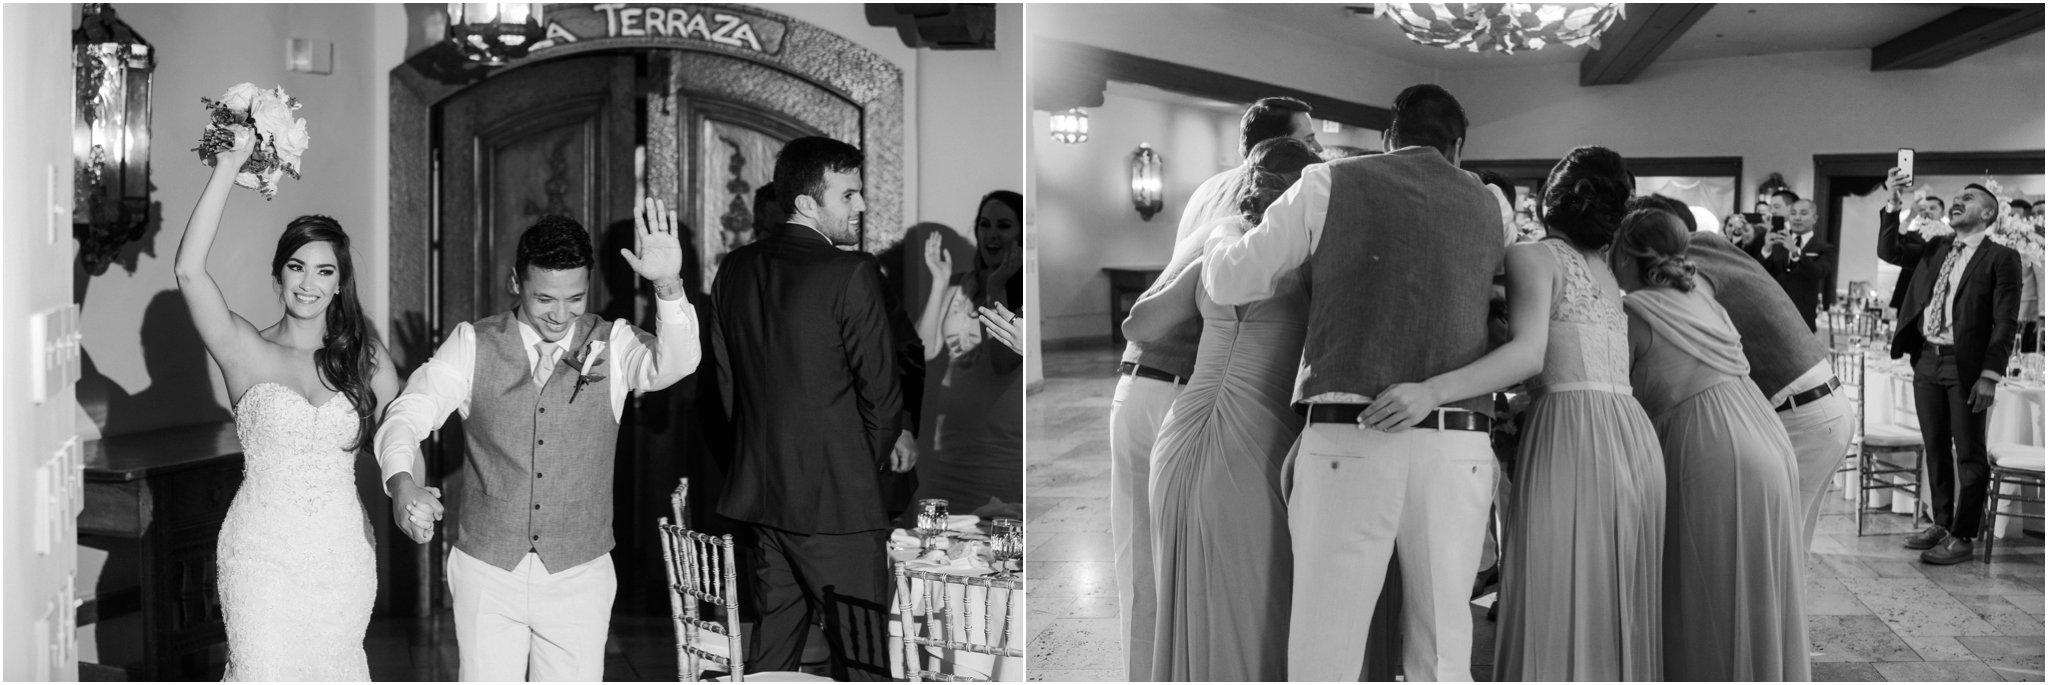 0052La Fonda Weddings Blue Rose Photography Studios